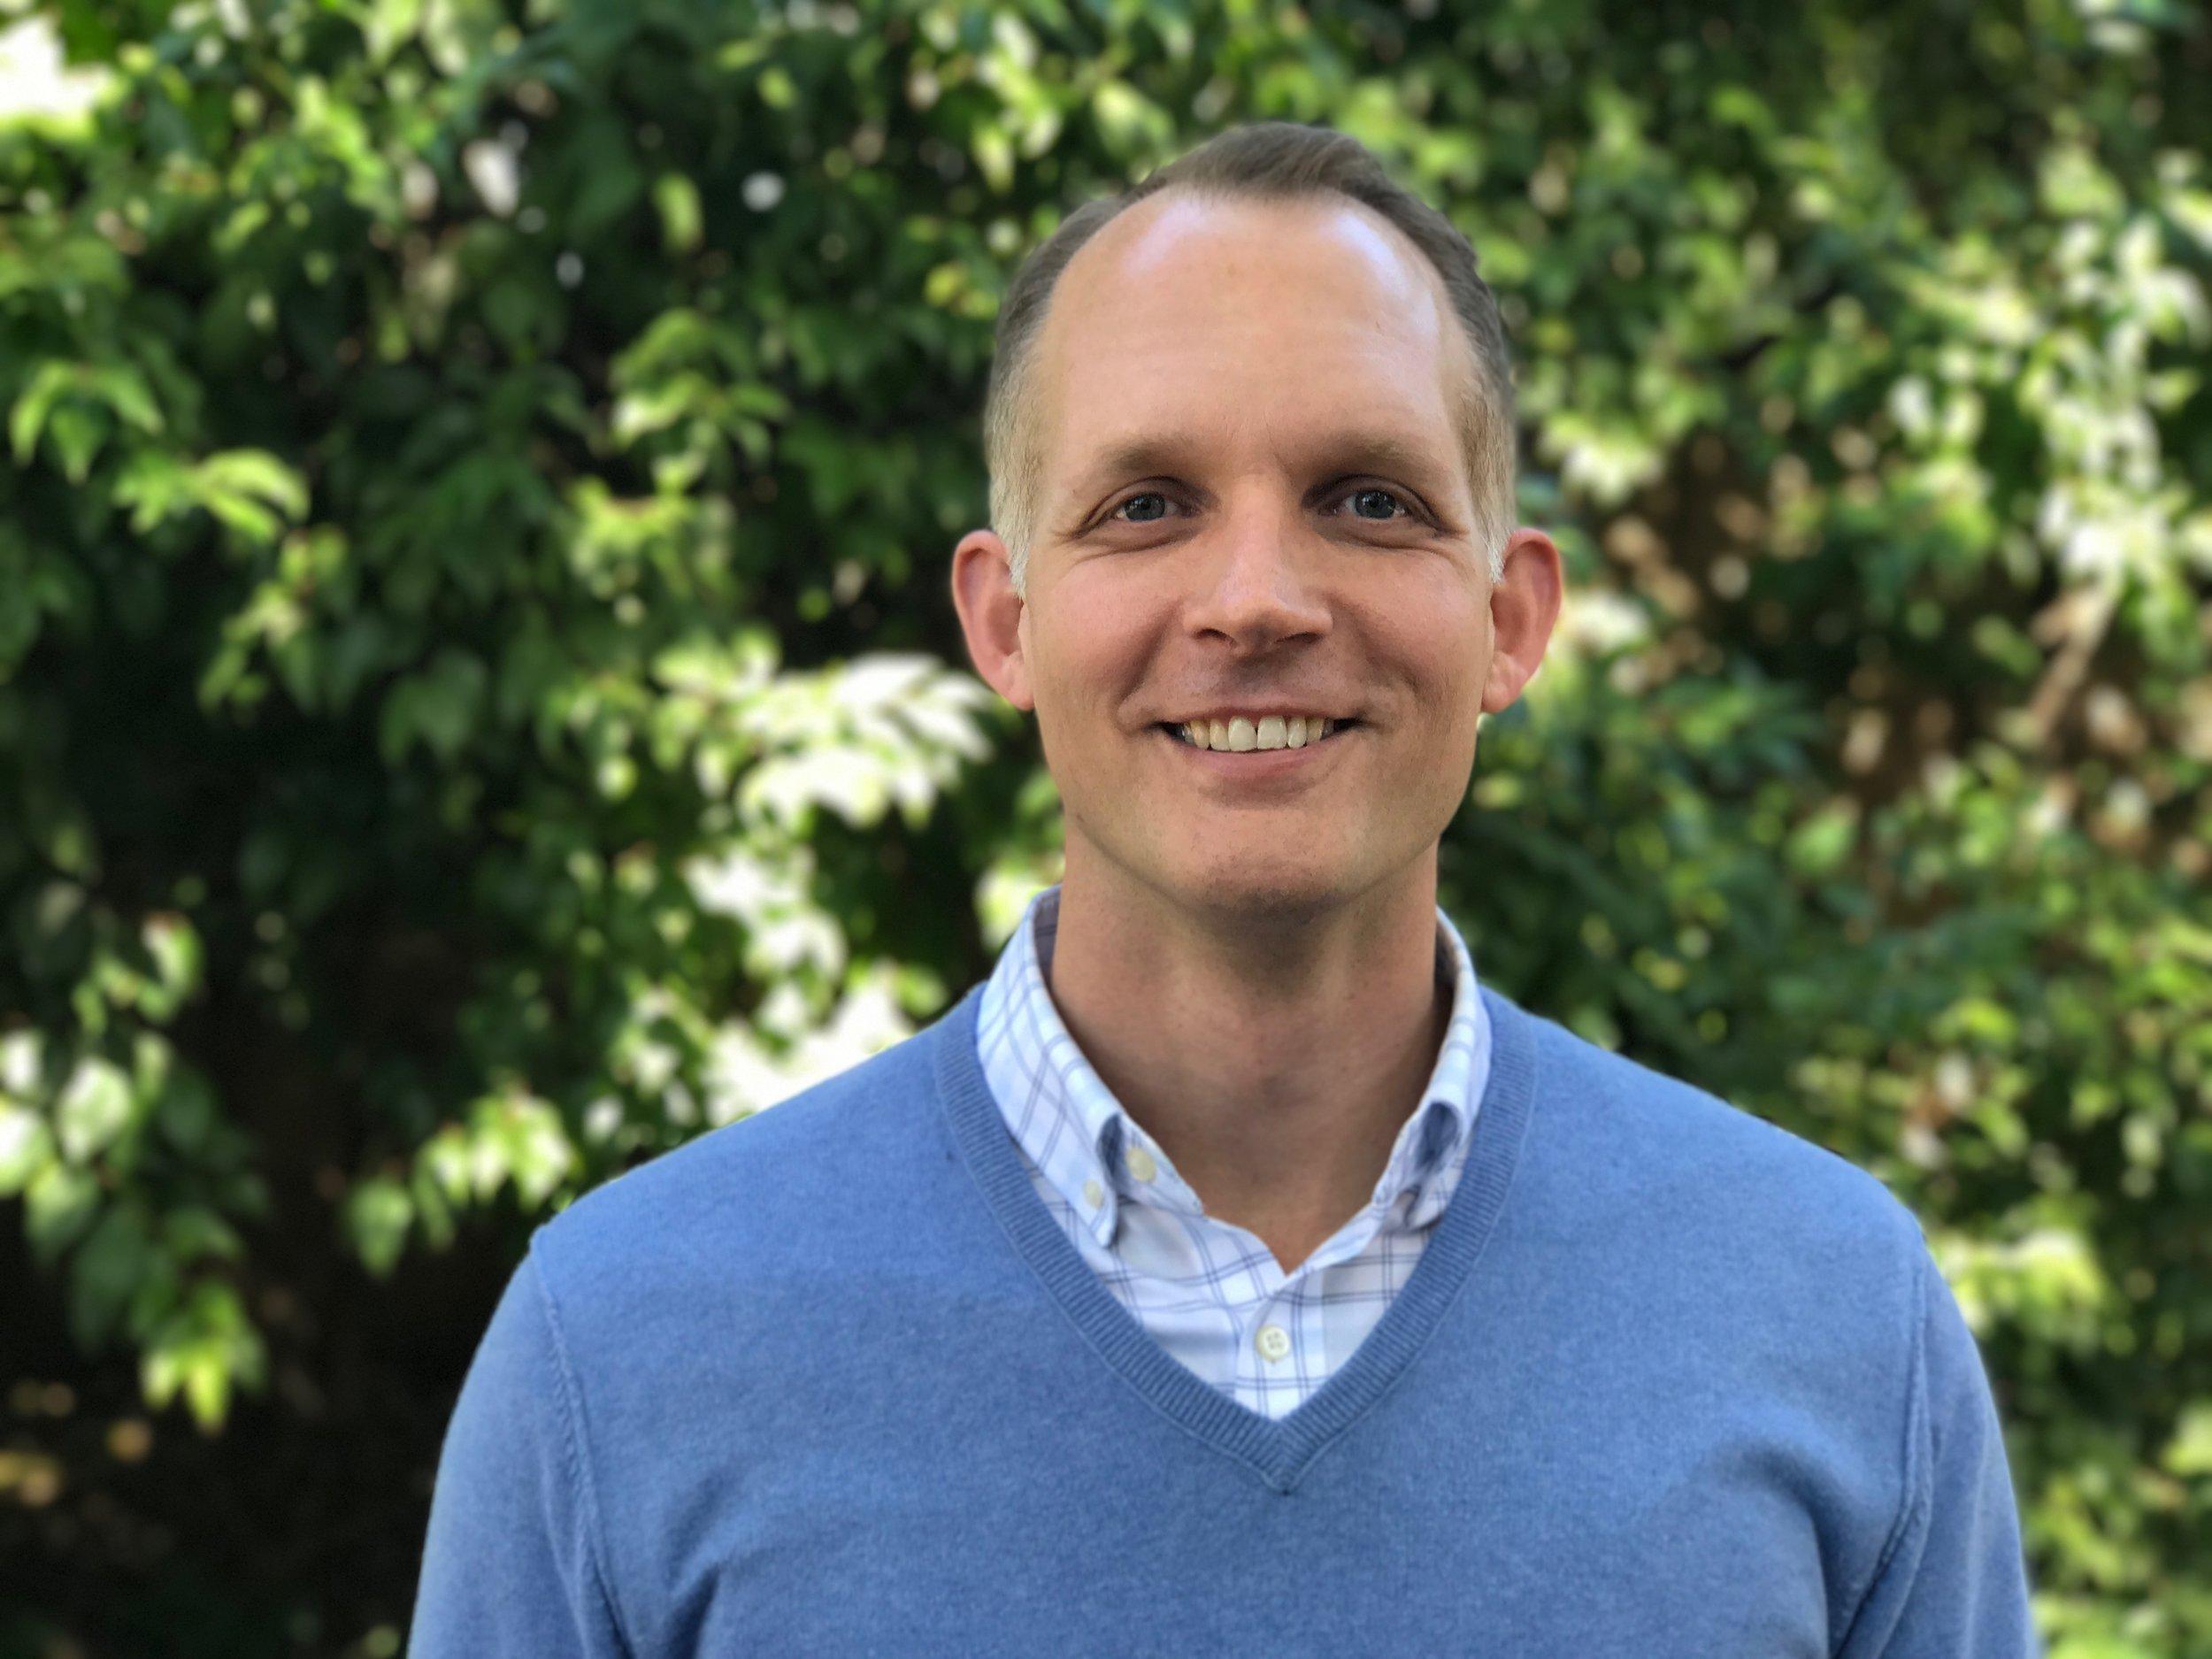 Michael Sapp, Ph.D. - Associate Executive Director